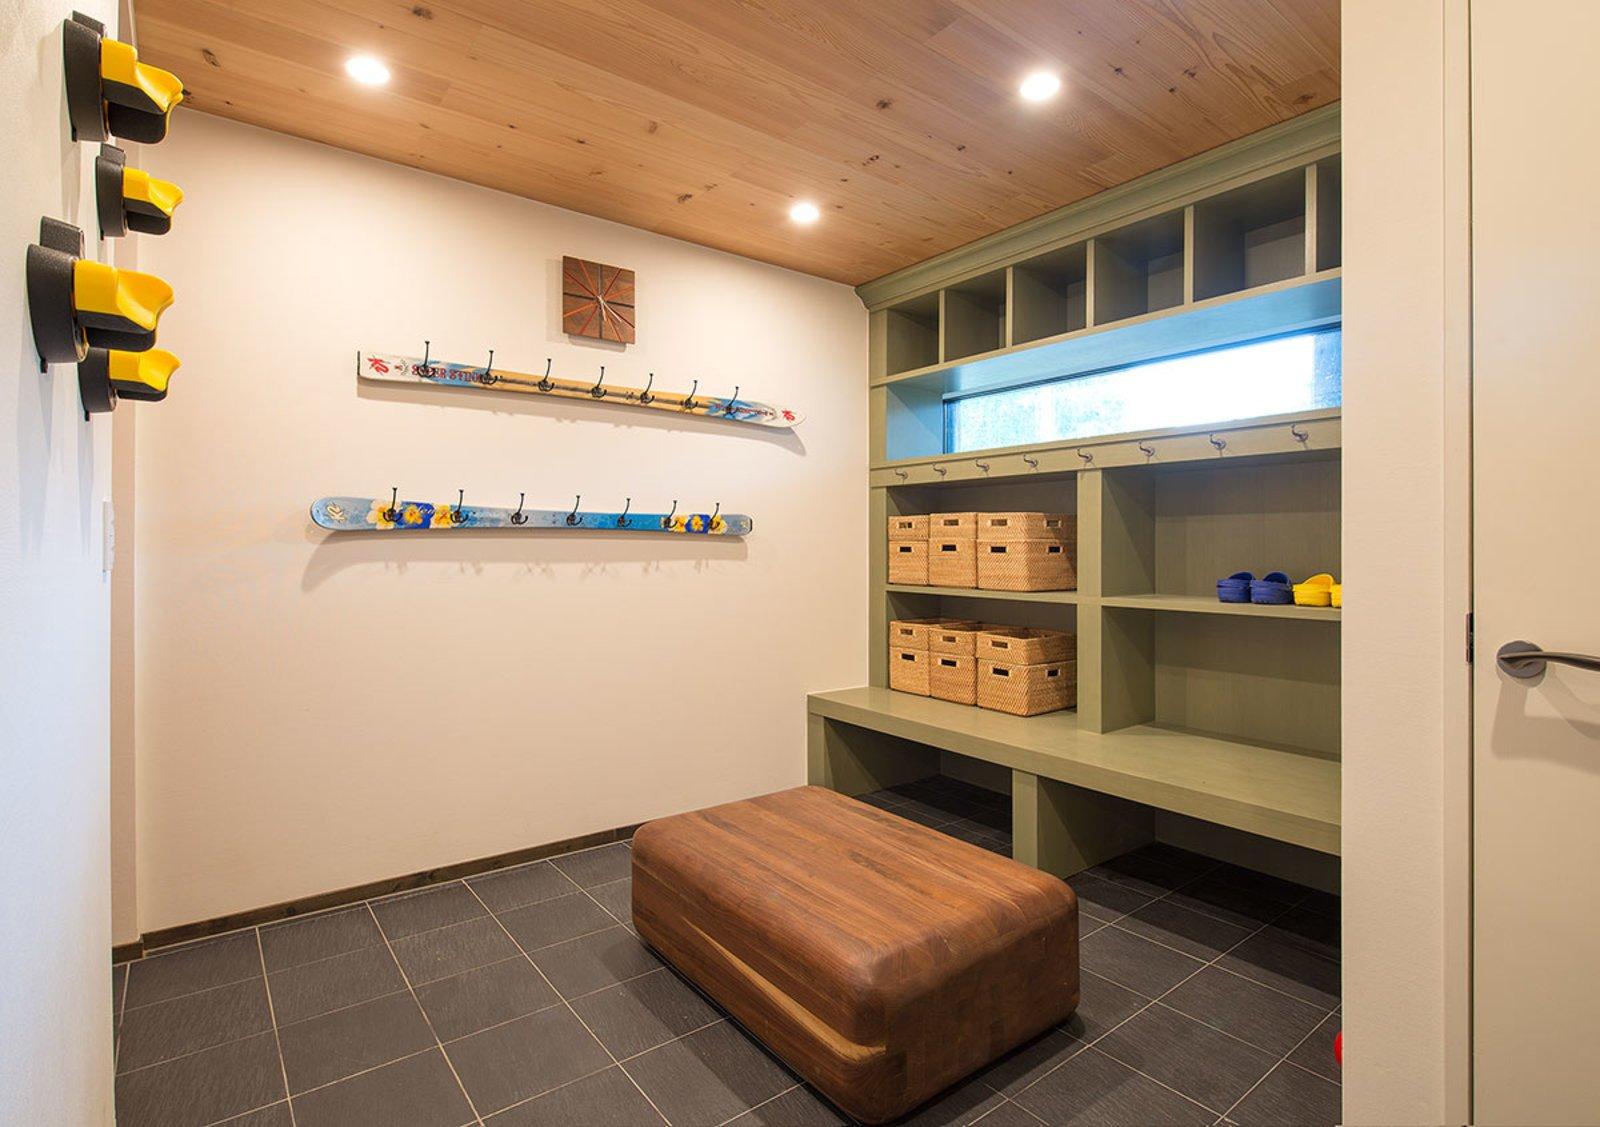 Gustav hideaway ski locker room large